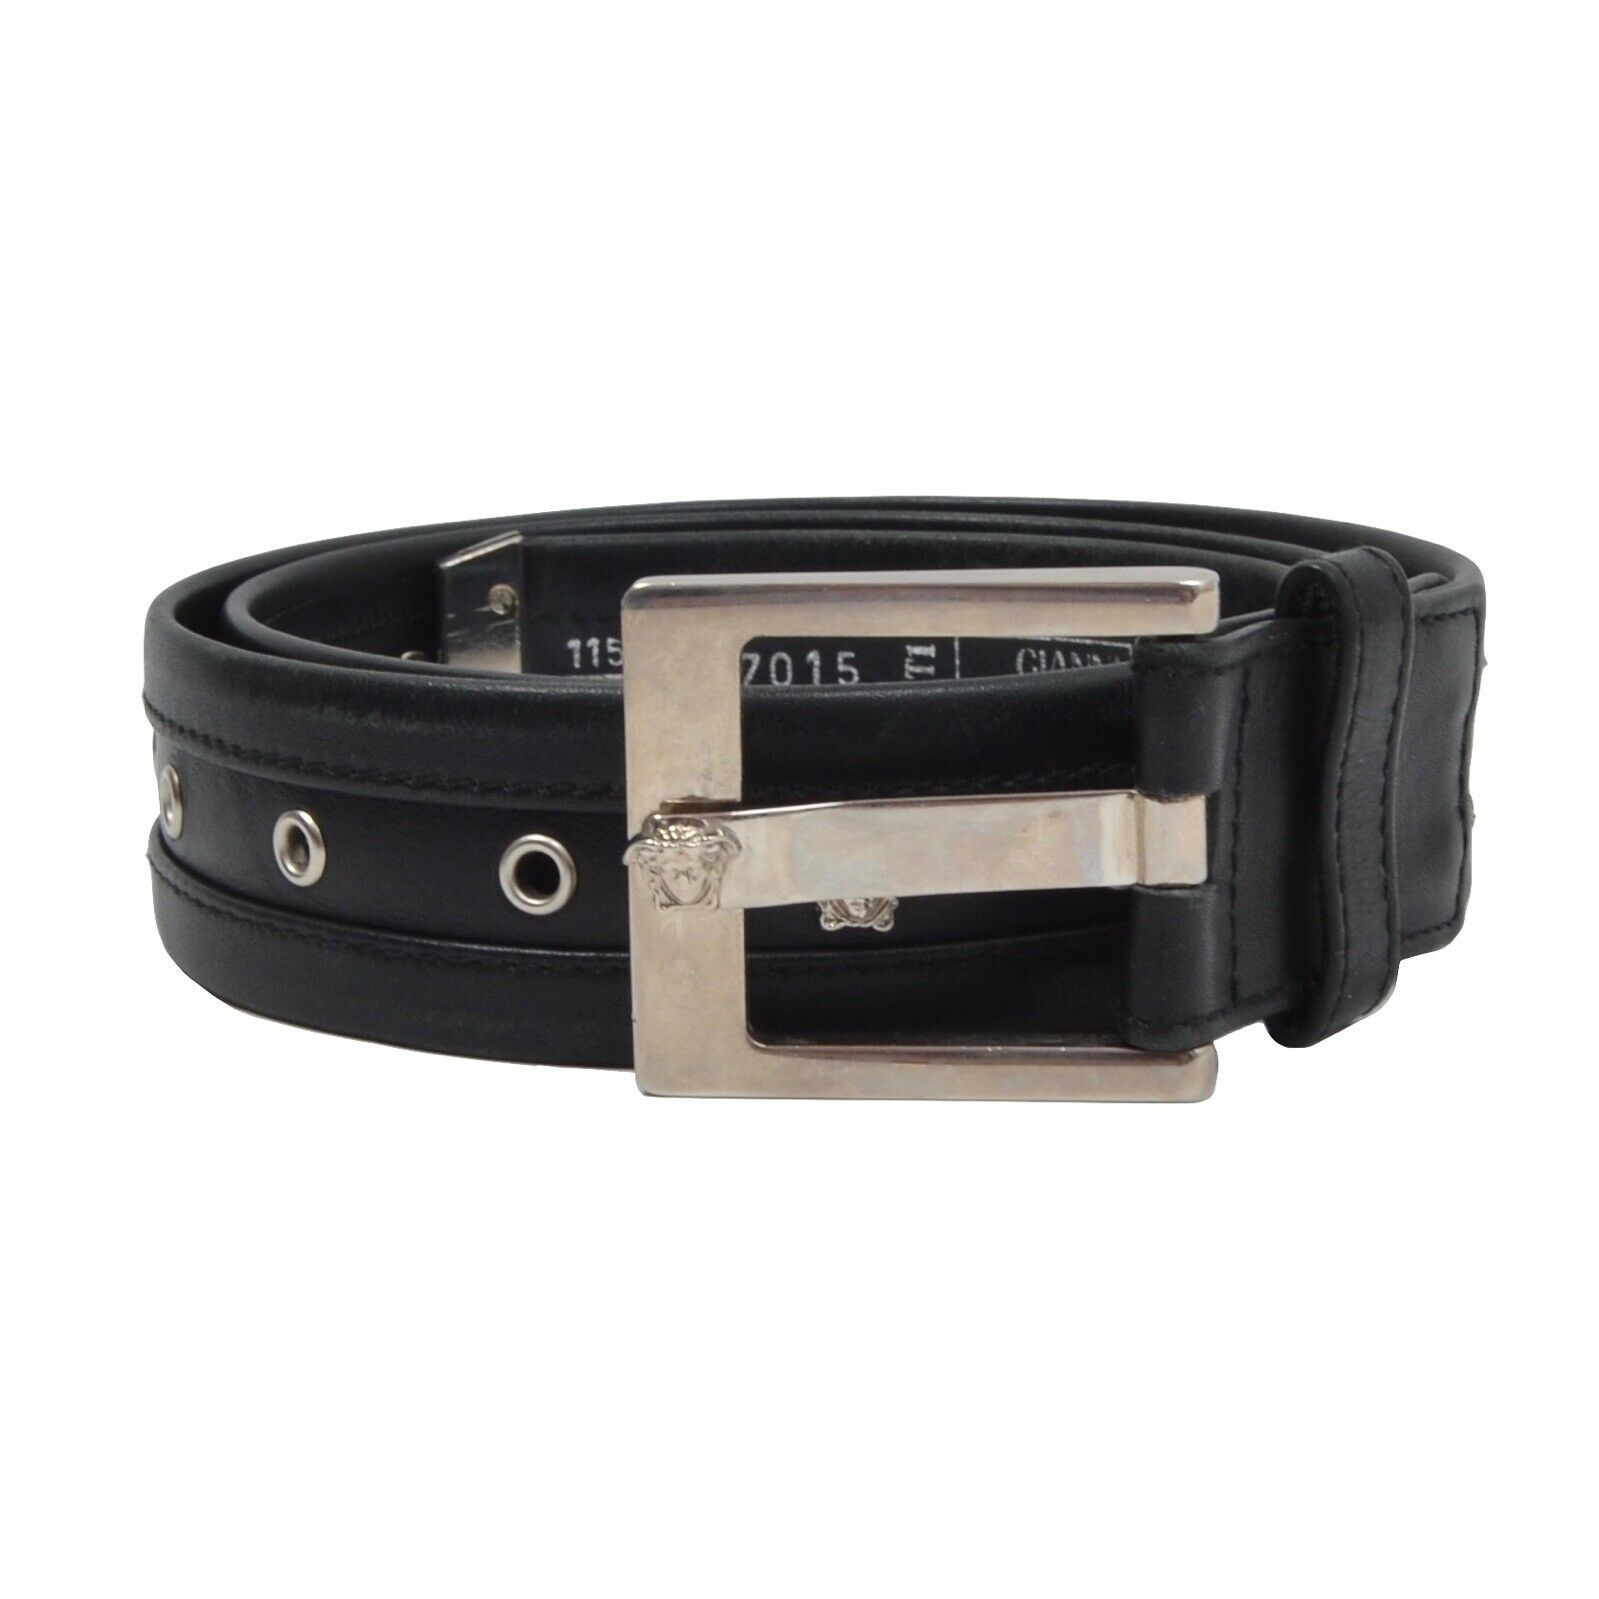 GIANNI VERSACE Vintage Gürtel Belt Medusa Made Italy 115 46 Schwarz Black 37015